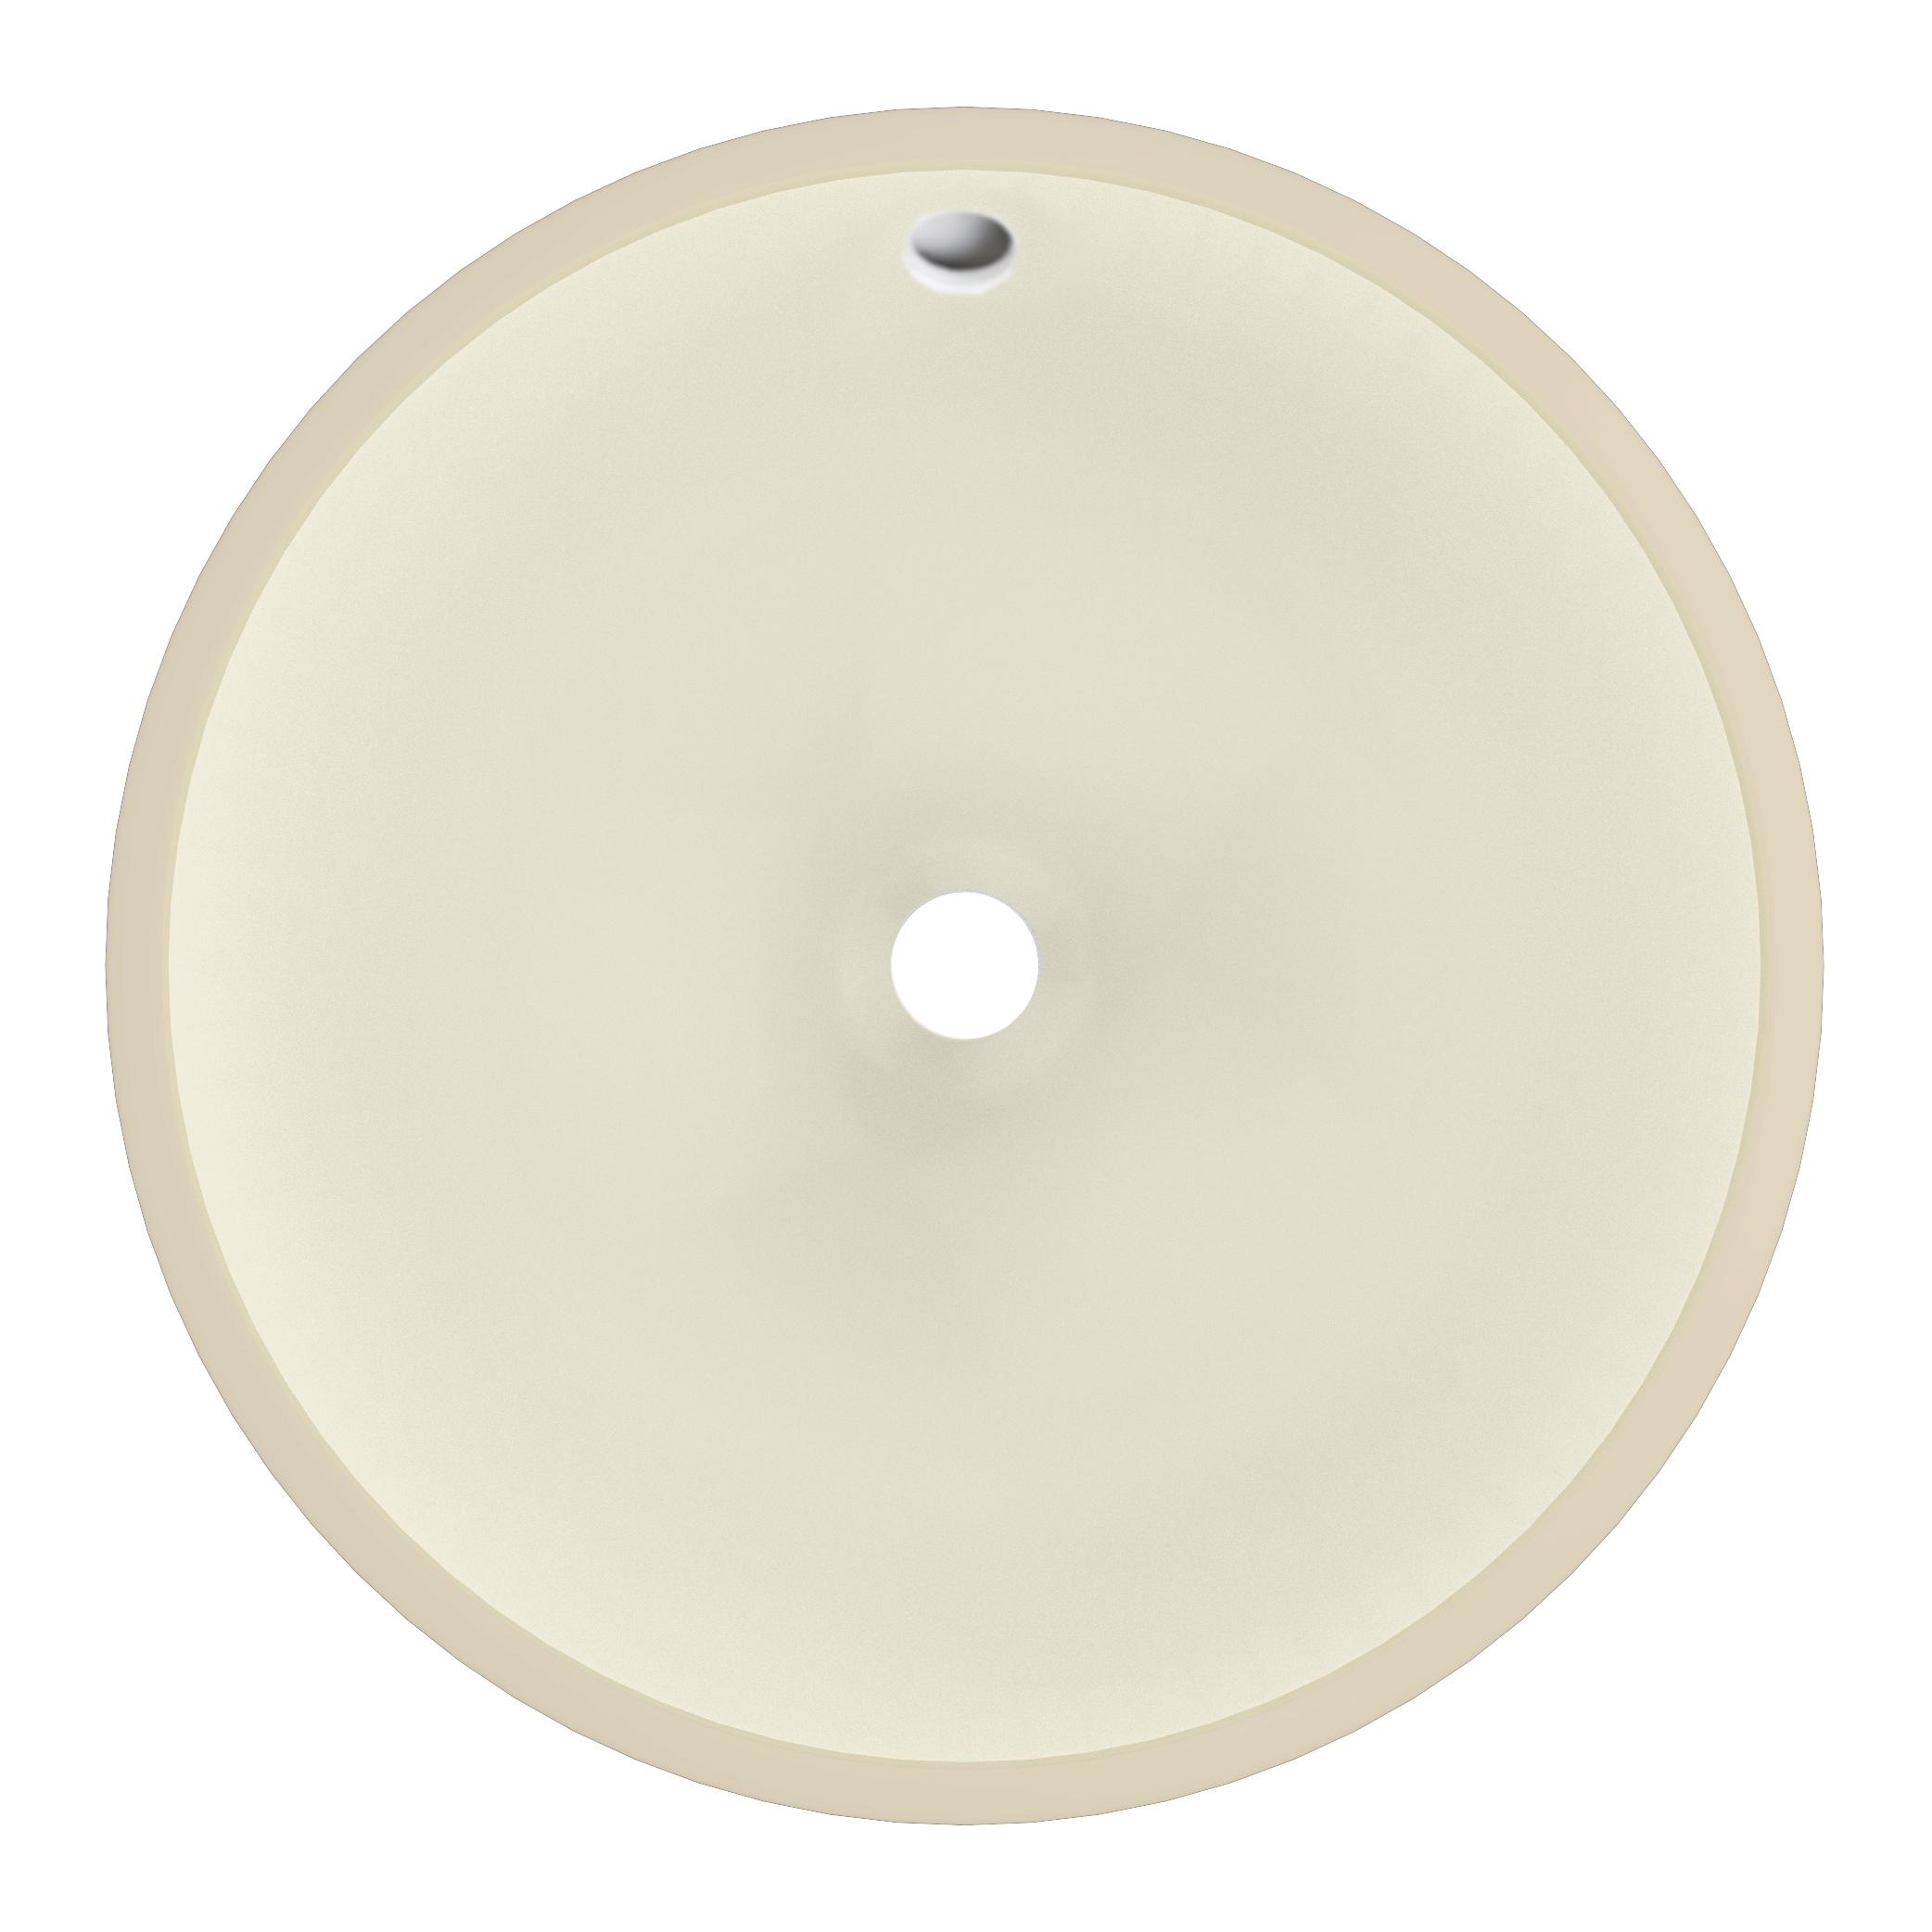 D Round Undermount Sink In Biscuit Color #PP 403